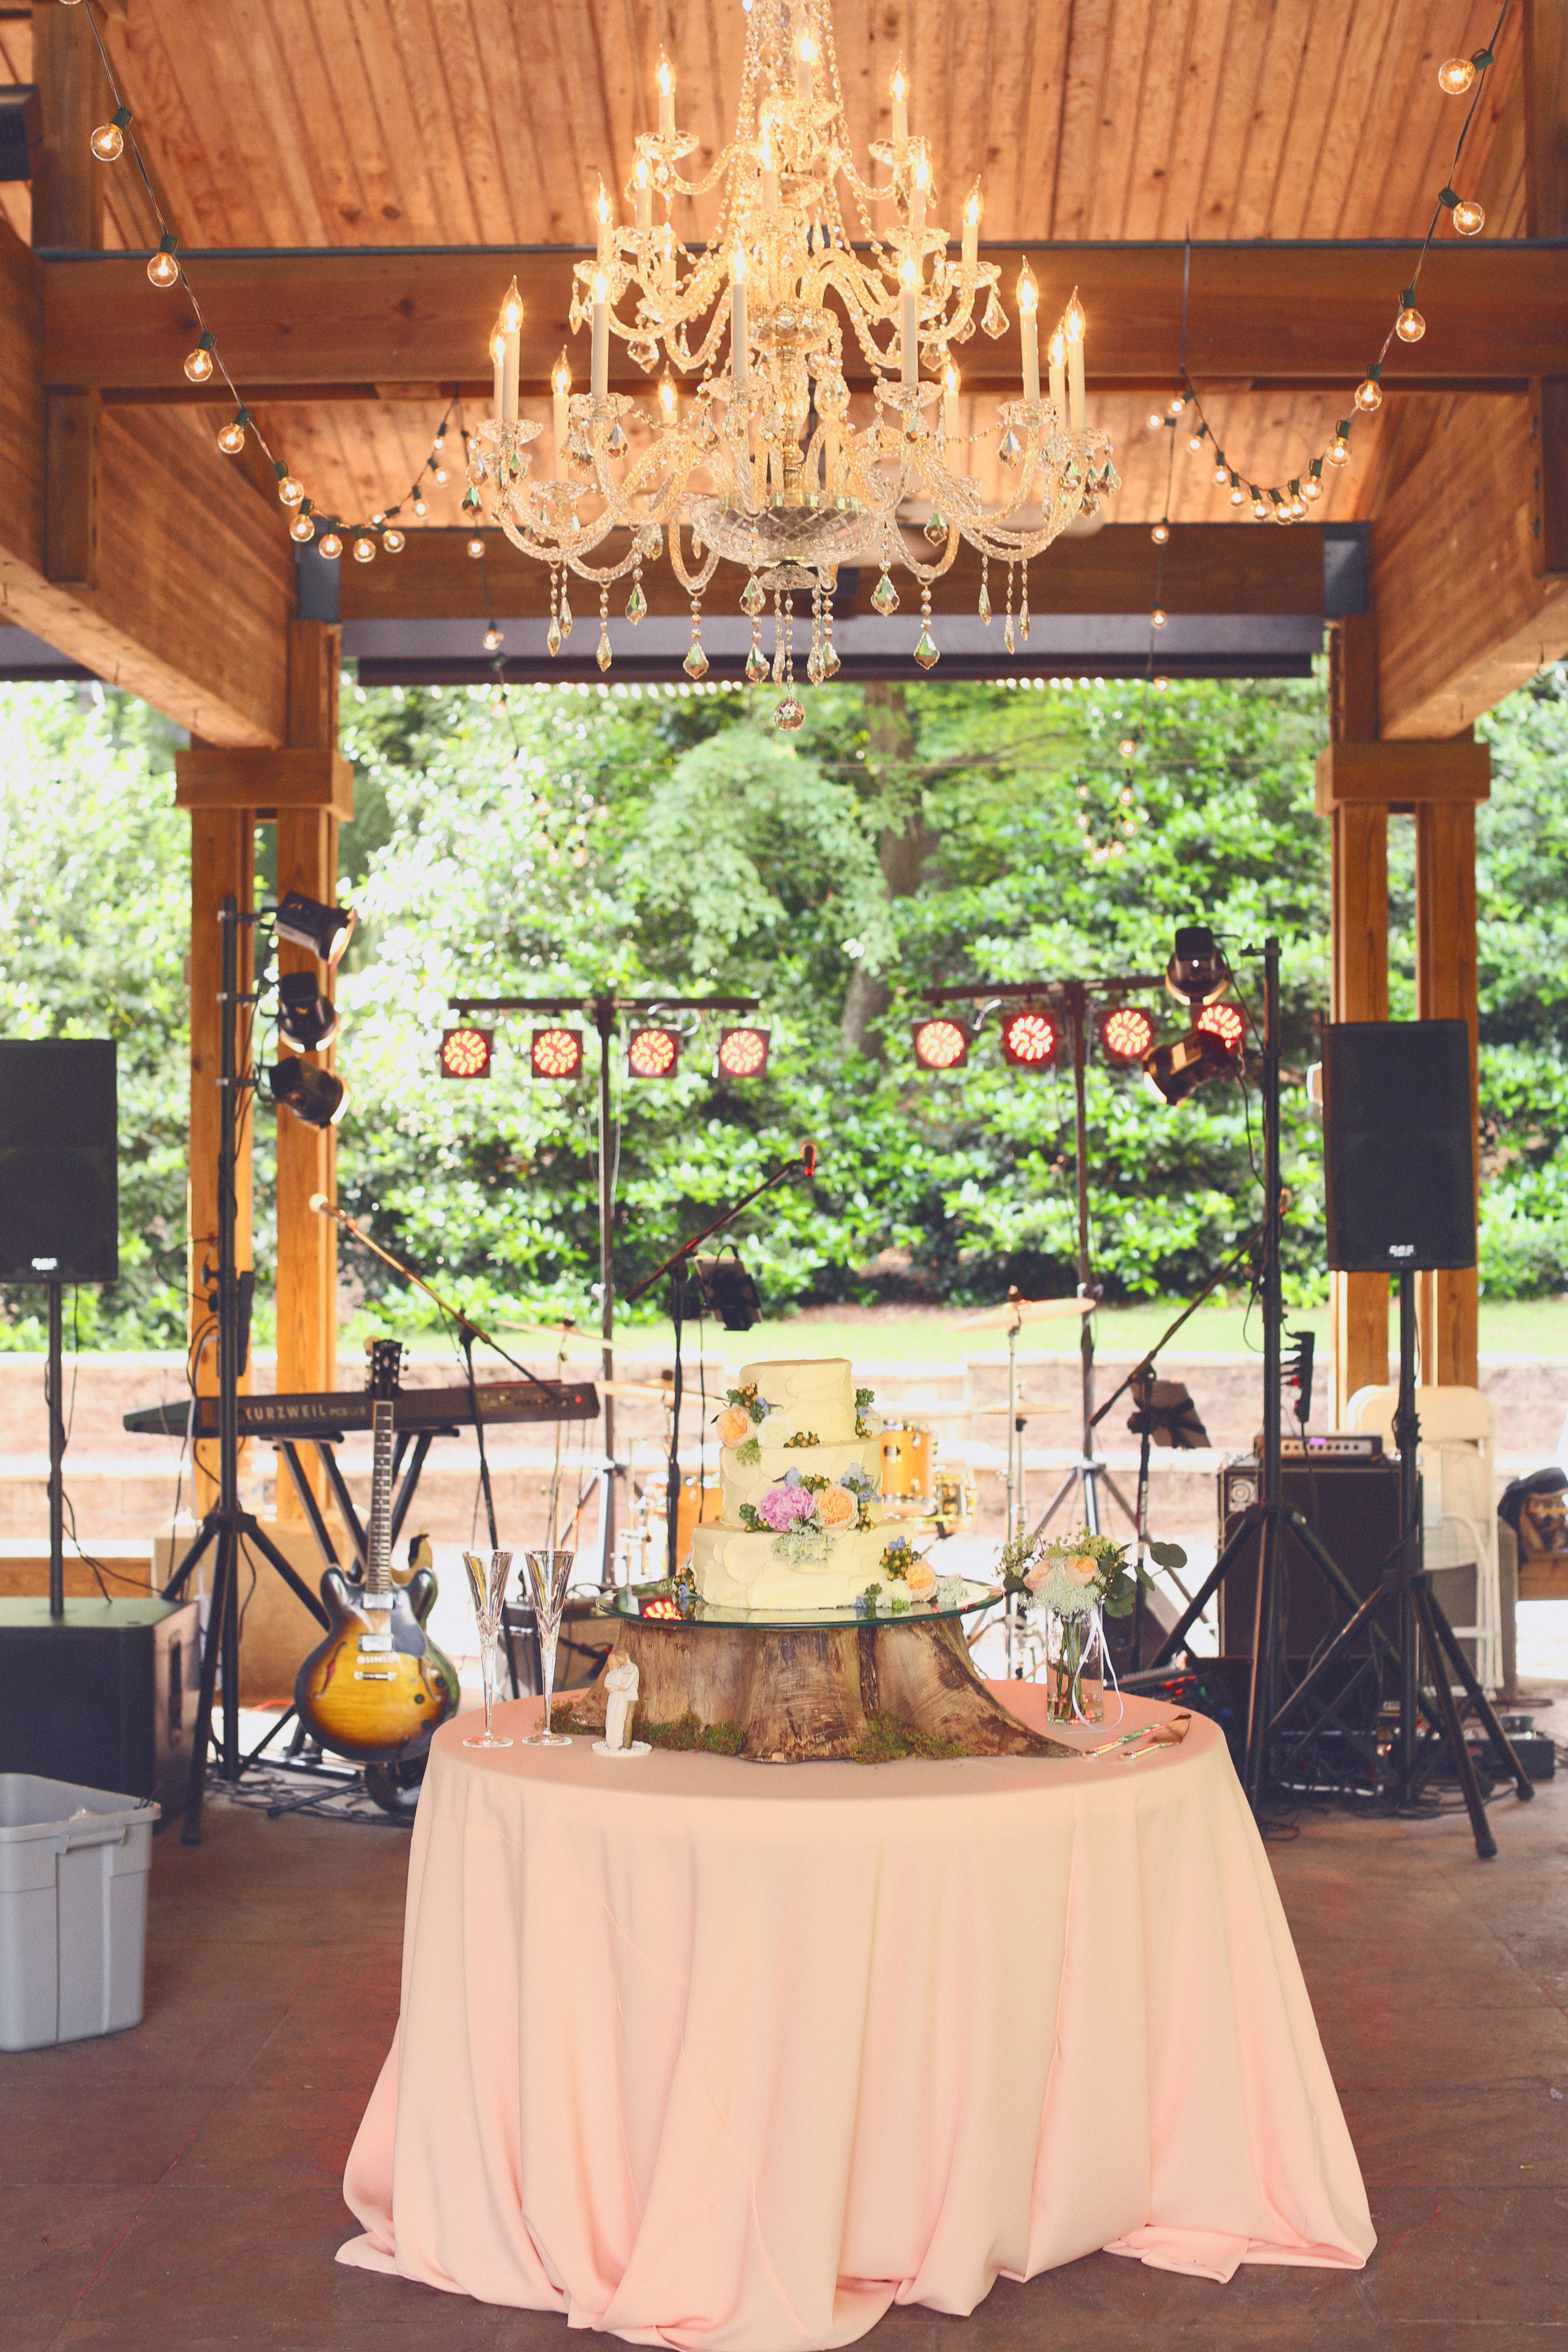 Beautiful Reception Under The Aldridge Gardens Pavilion 5 17 15 J